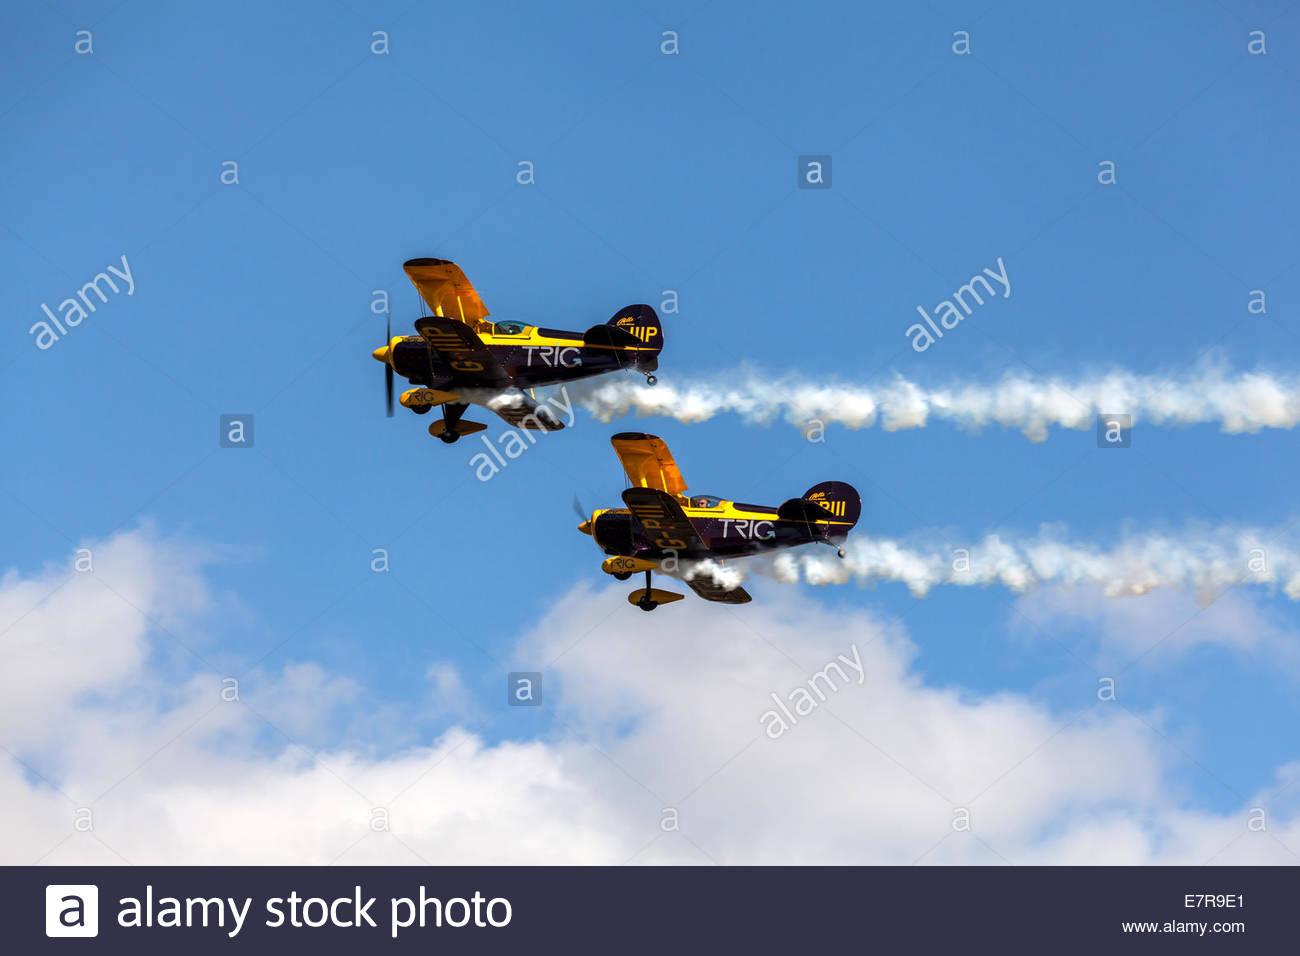 Trig Aerobatic Team - Stock Image